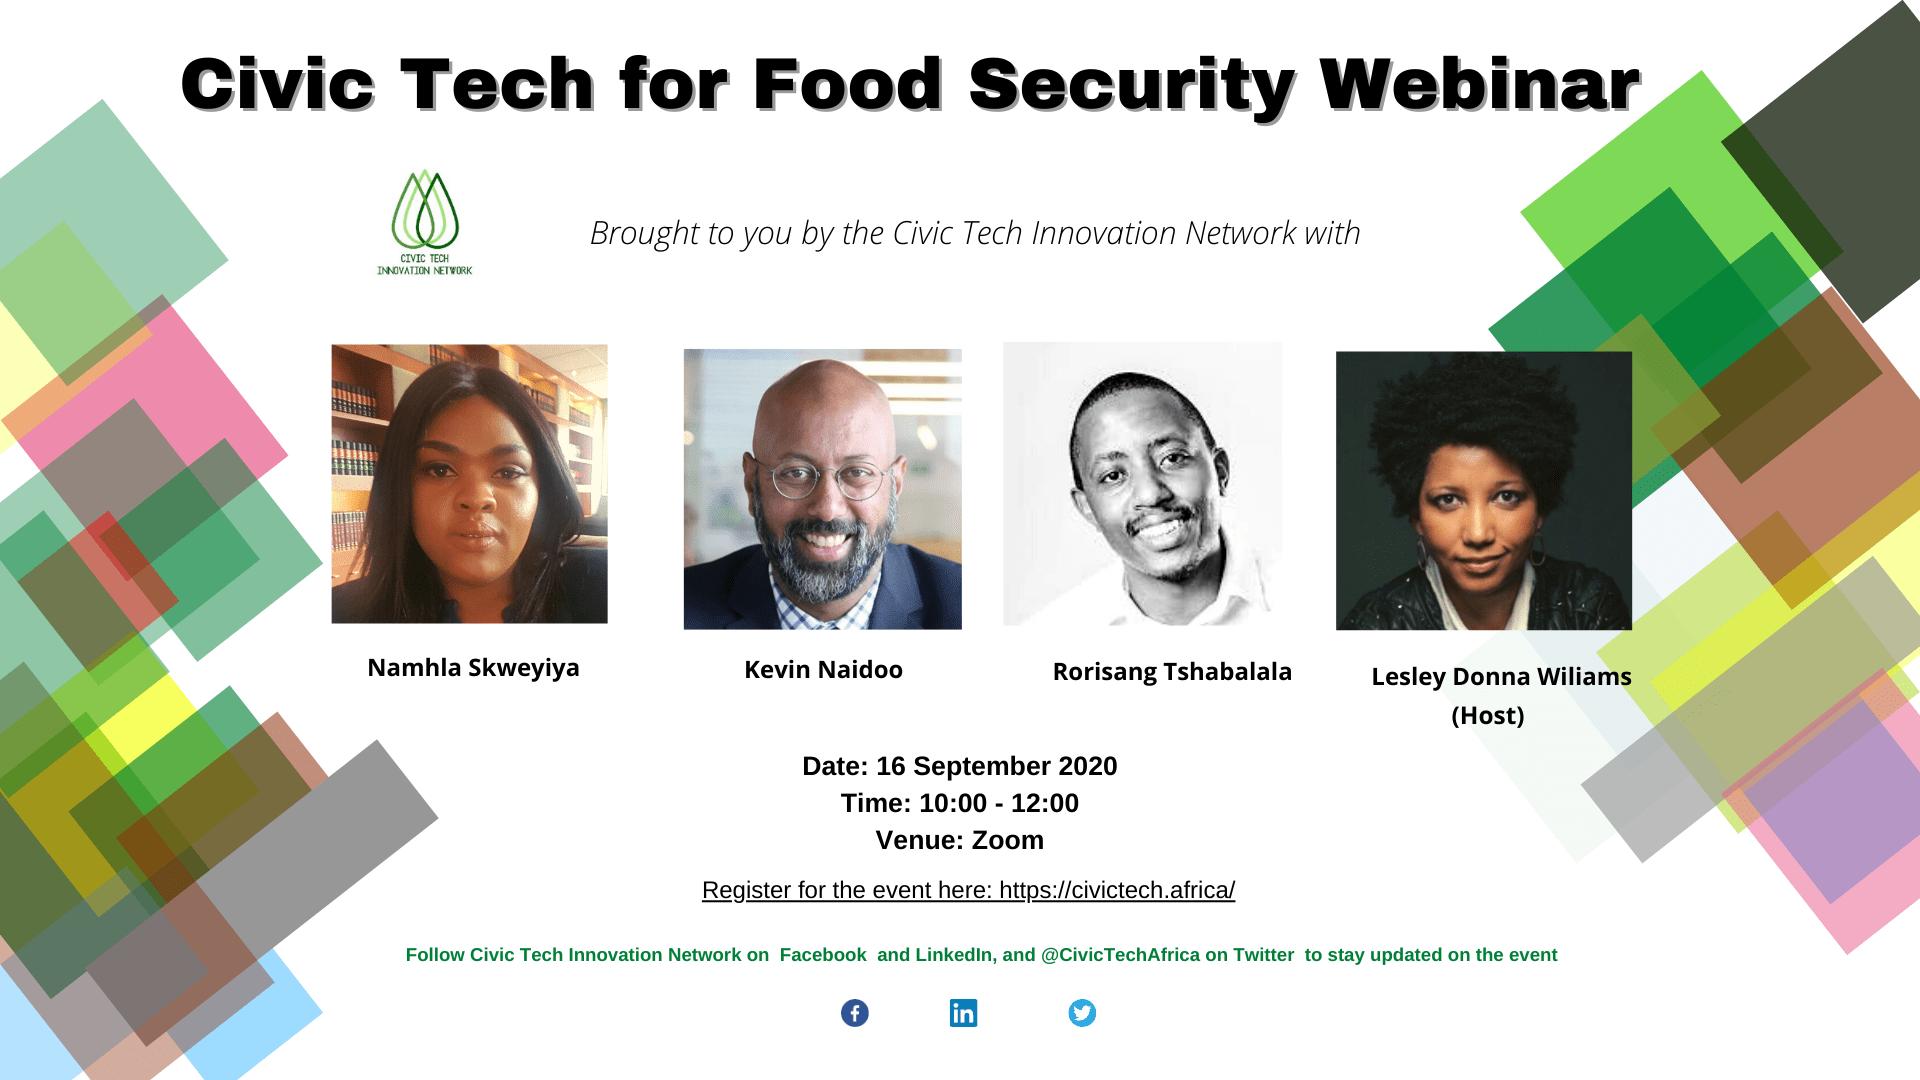 Civic Tech for Food Security Webinar